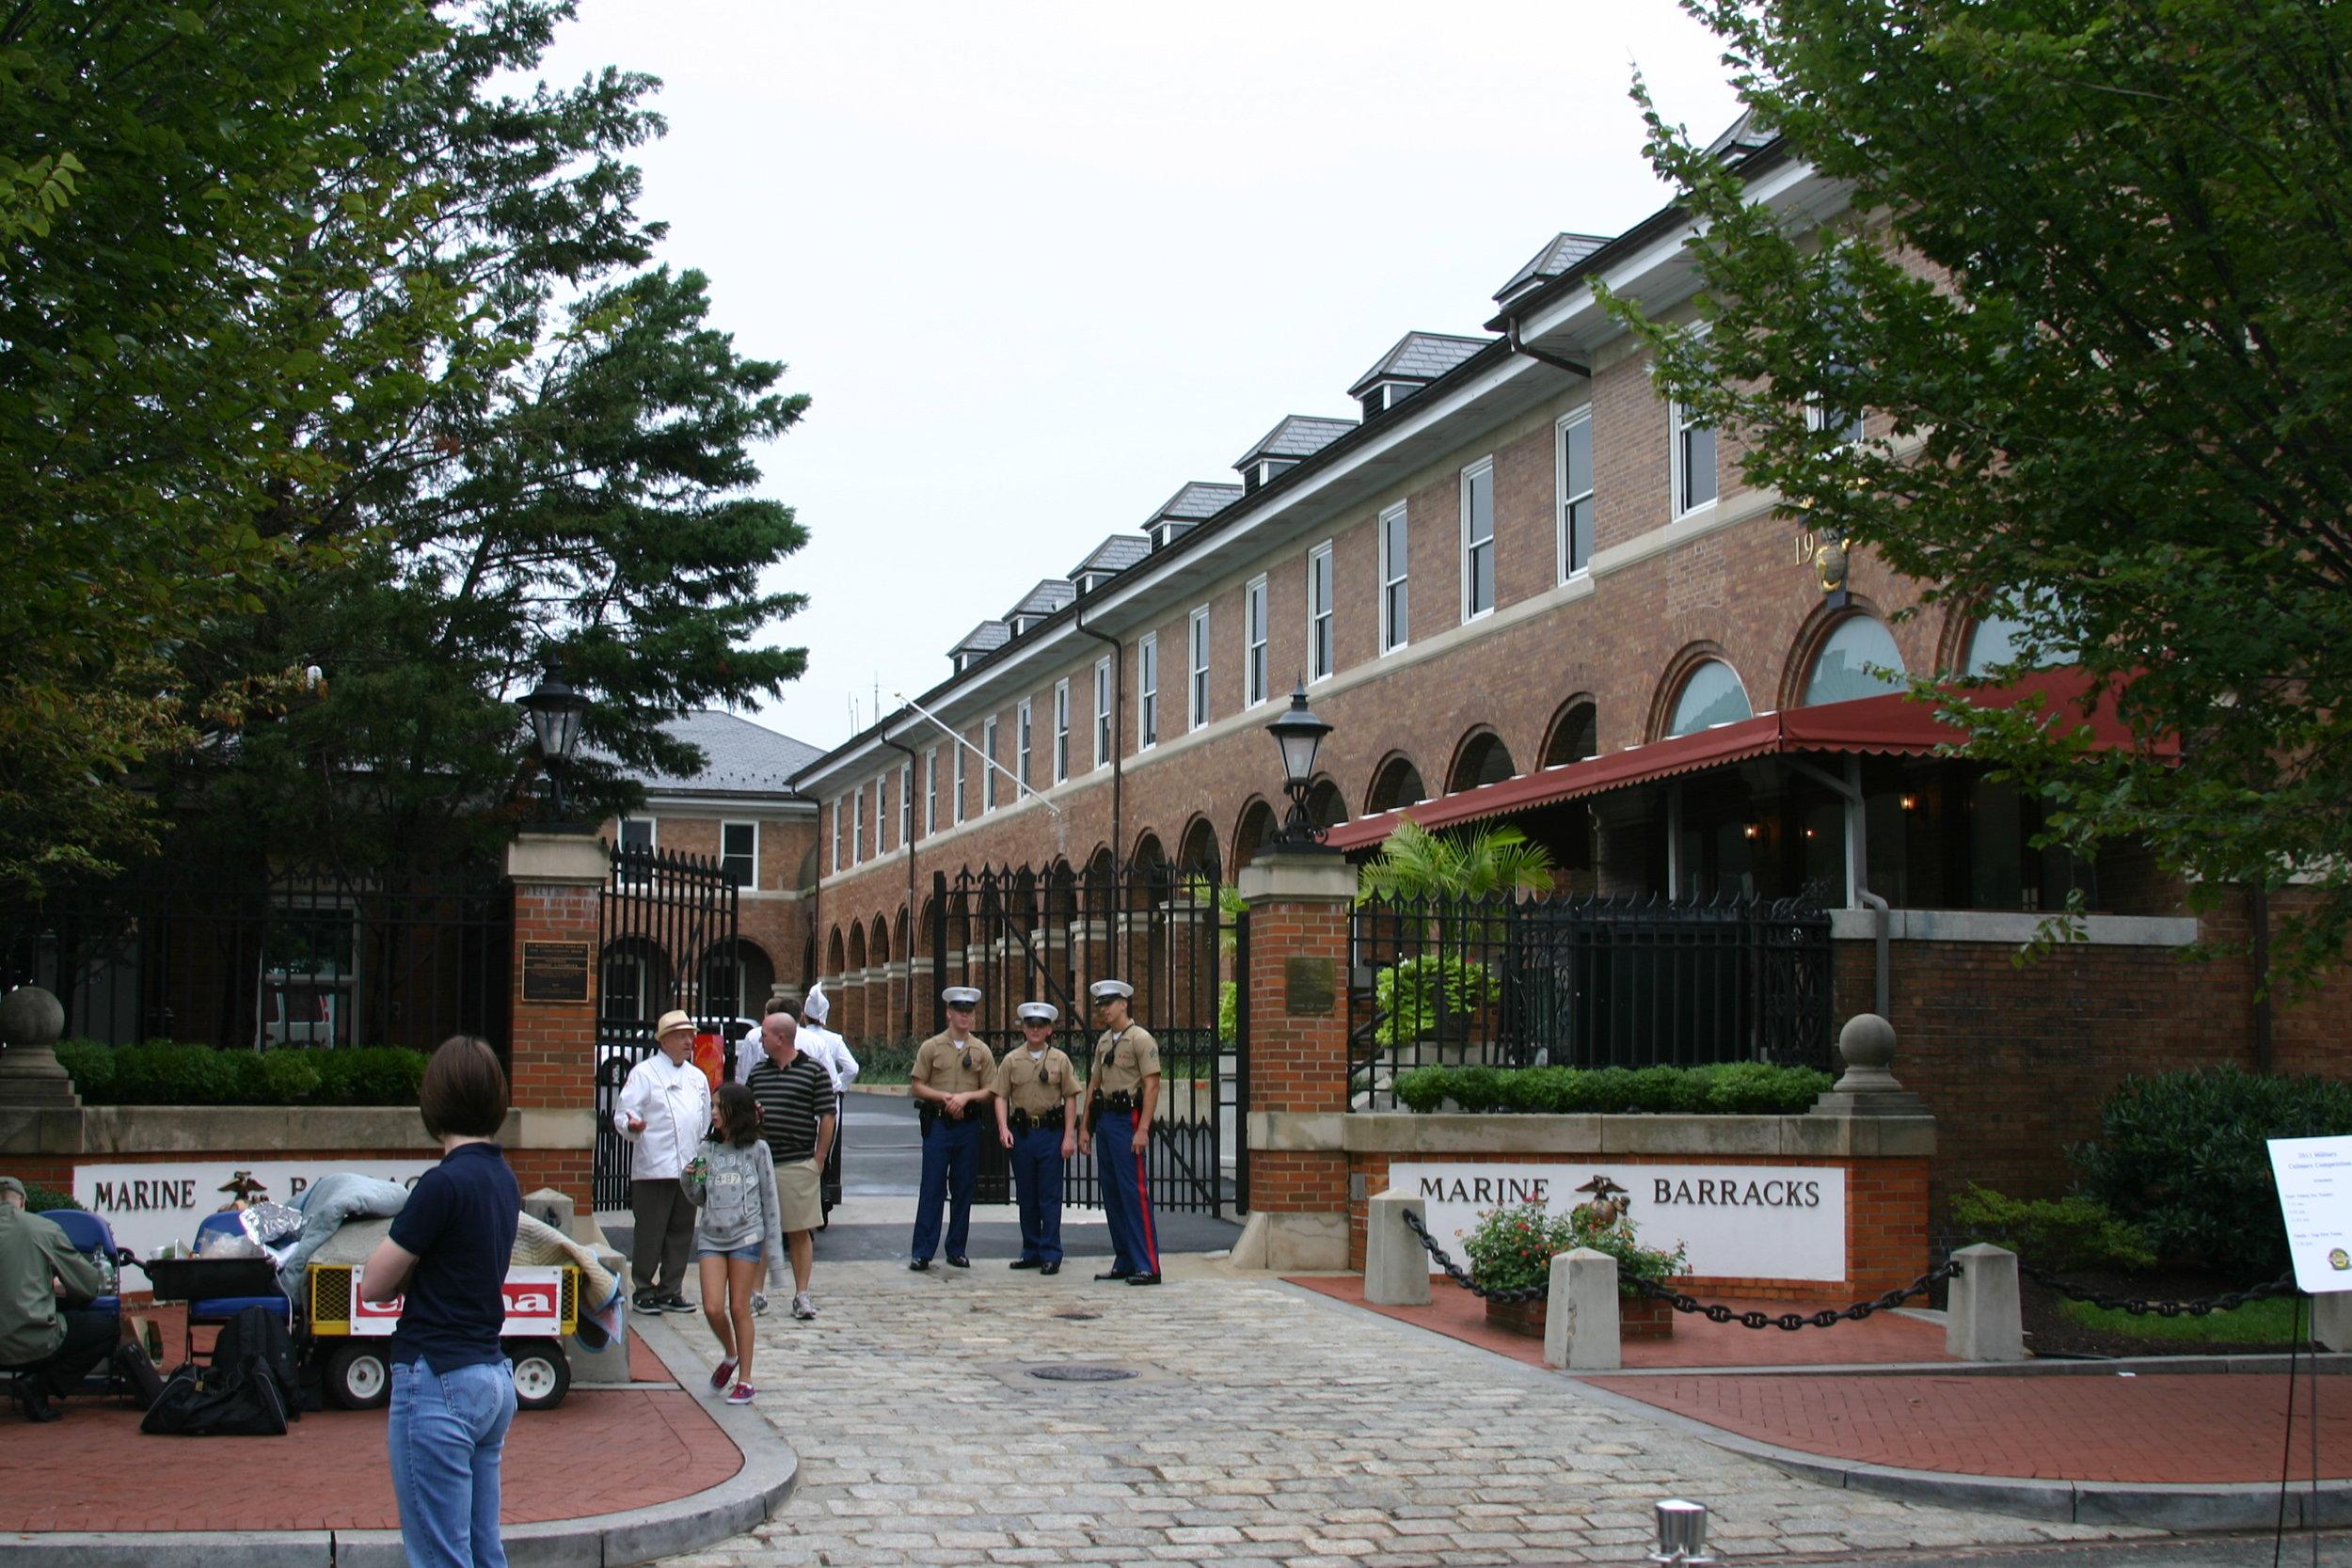 Marine Barracks, Barracks Row, Capitol Hill, Washington, DC